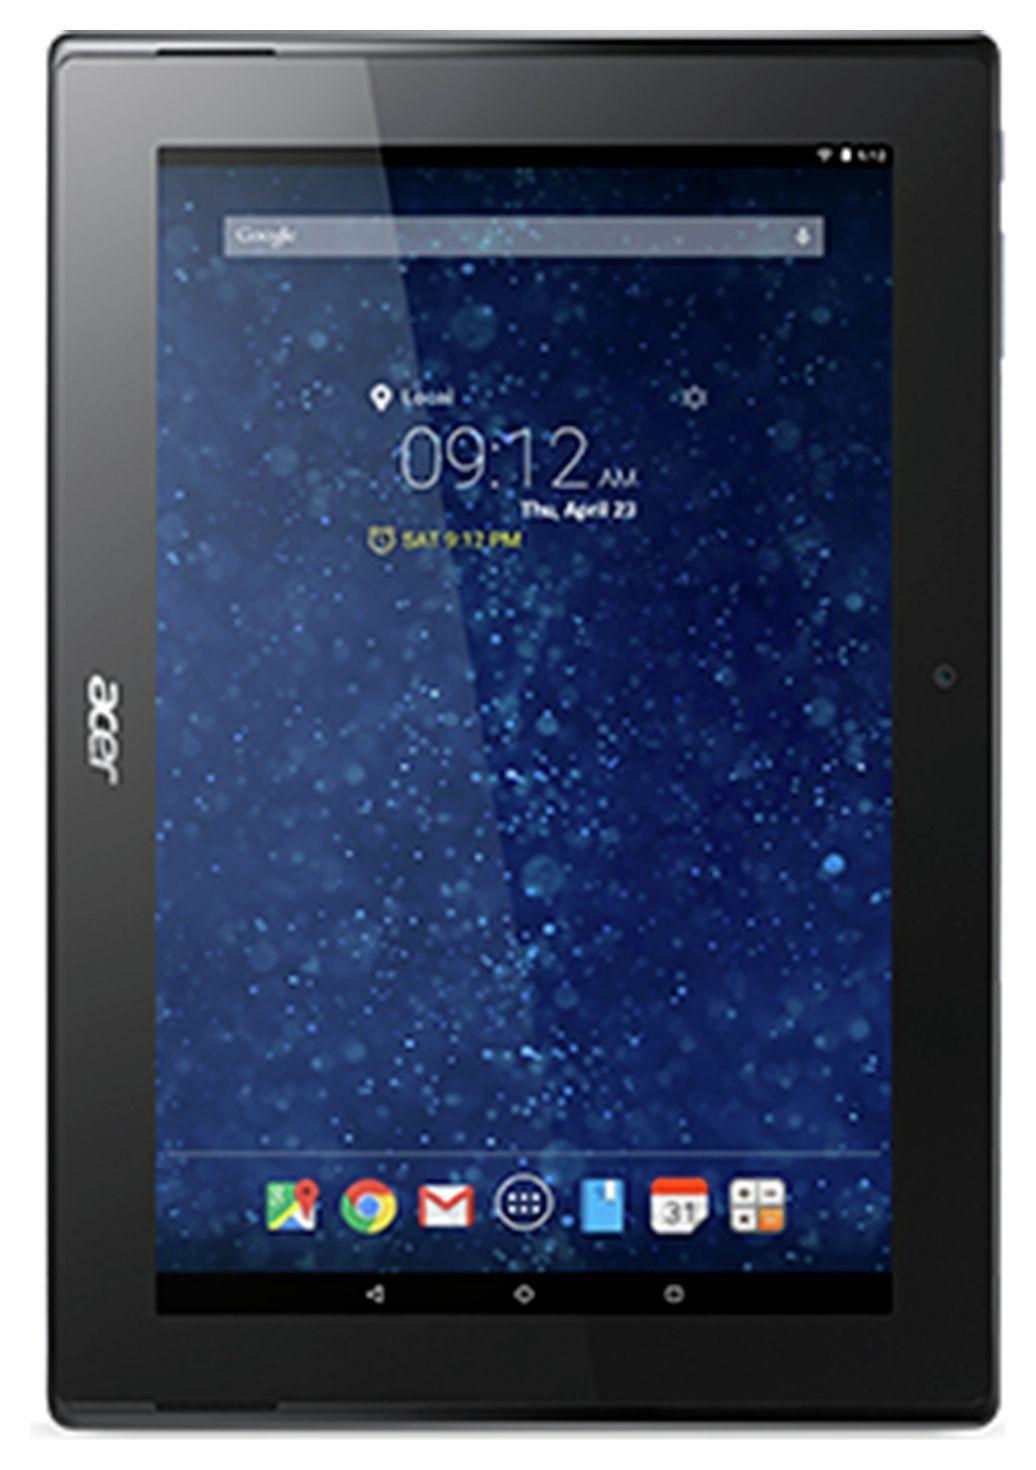 Brand new Acer Iconia Tab10 Full HD 10.1 Inch 32GB Tablet £119.99 @ Argos ebay